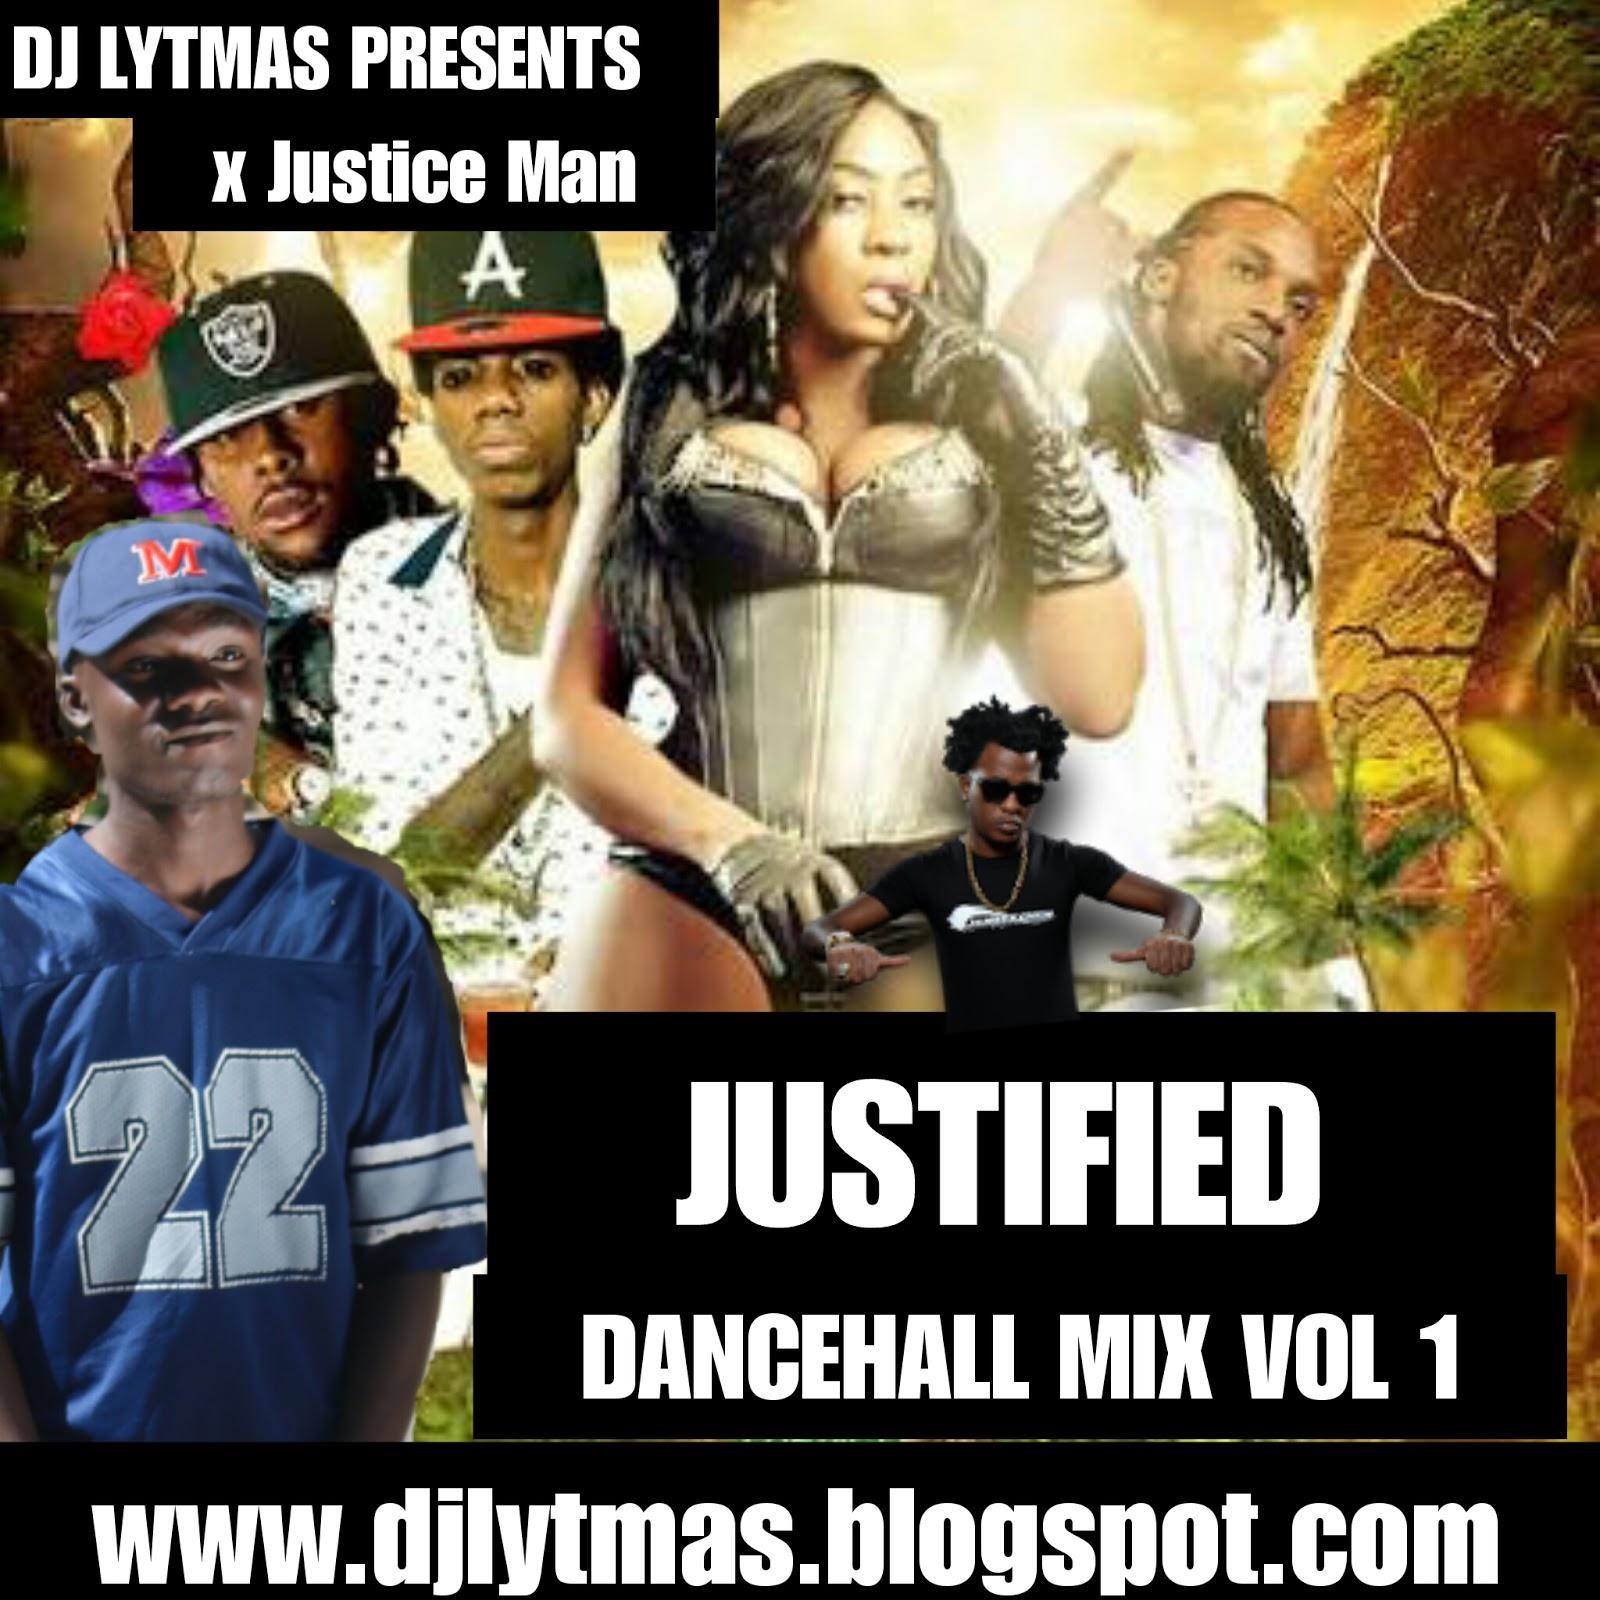 DJ LYTMAS - DANCEHALL JUSTIFIED VOL 1 X JUSTICE MAN 3hrs of